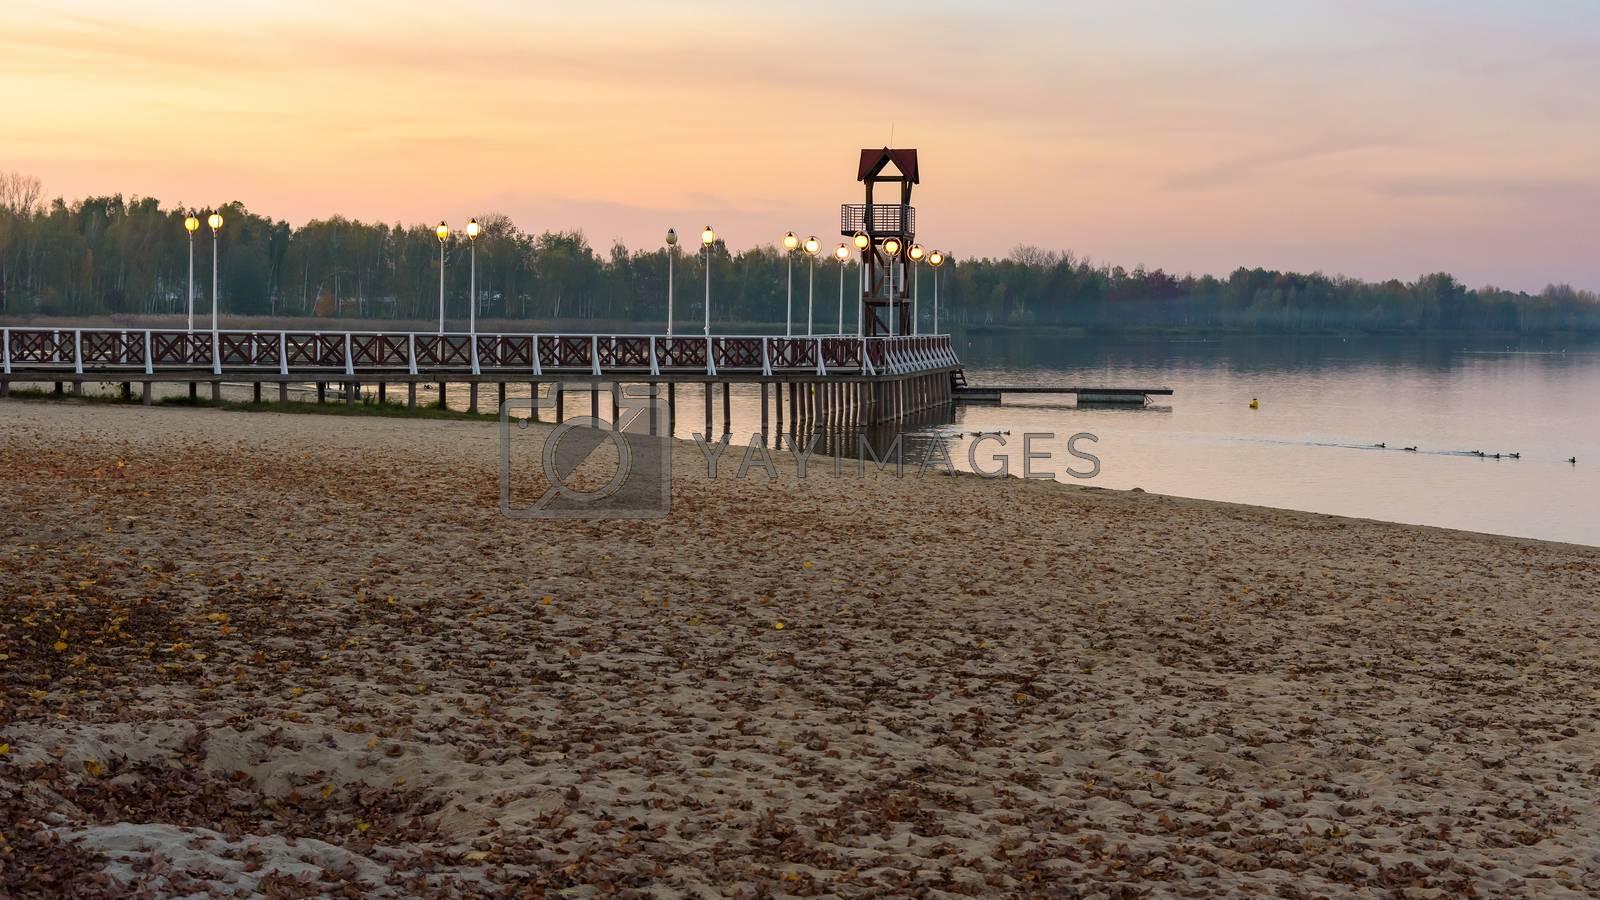 Evening autumn view of beach and pier at Pogoria III lake in Dabrowa Gornicza, Poland